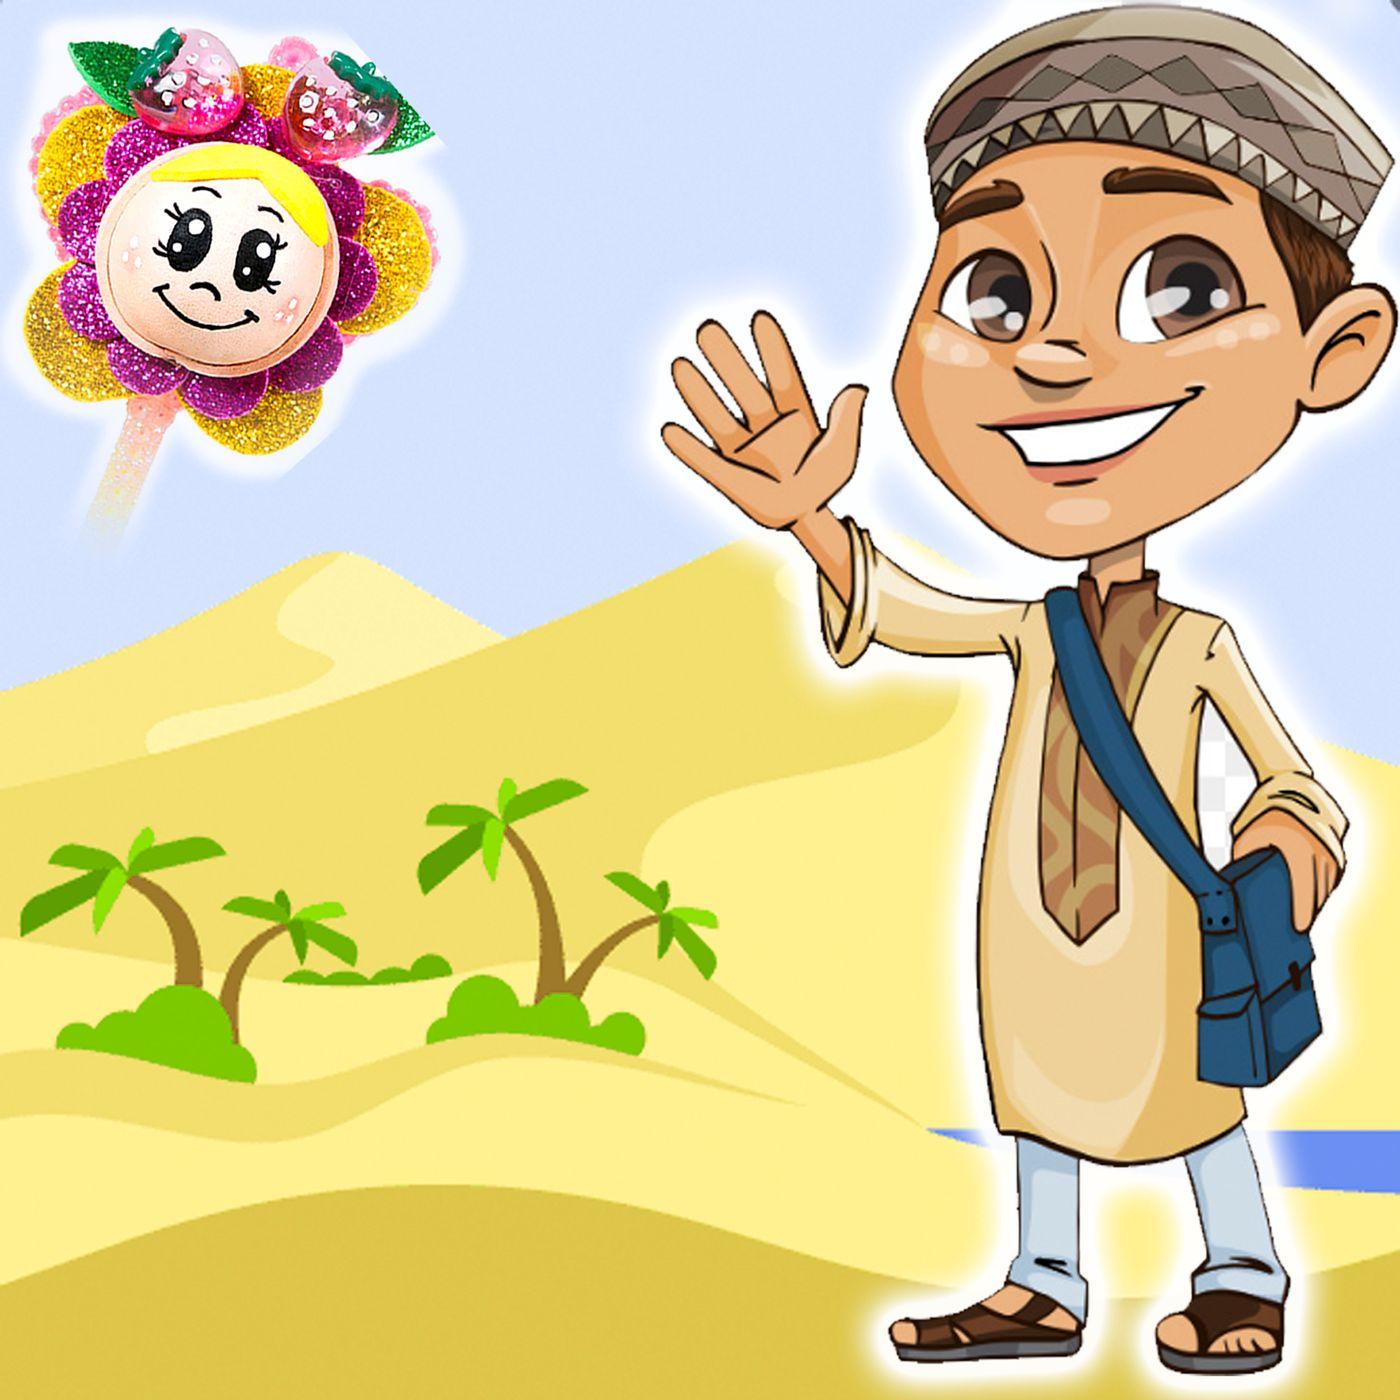 15. El viaje al oasis de Kairouan. Cuento infantil de Hada de Fresa